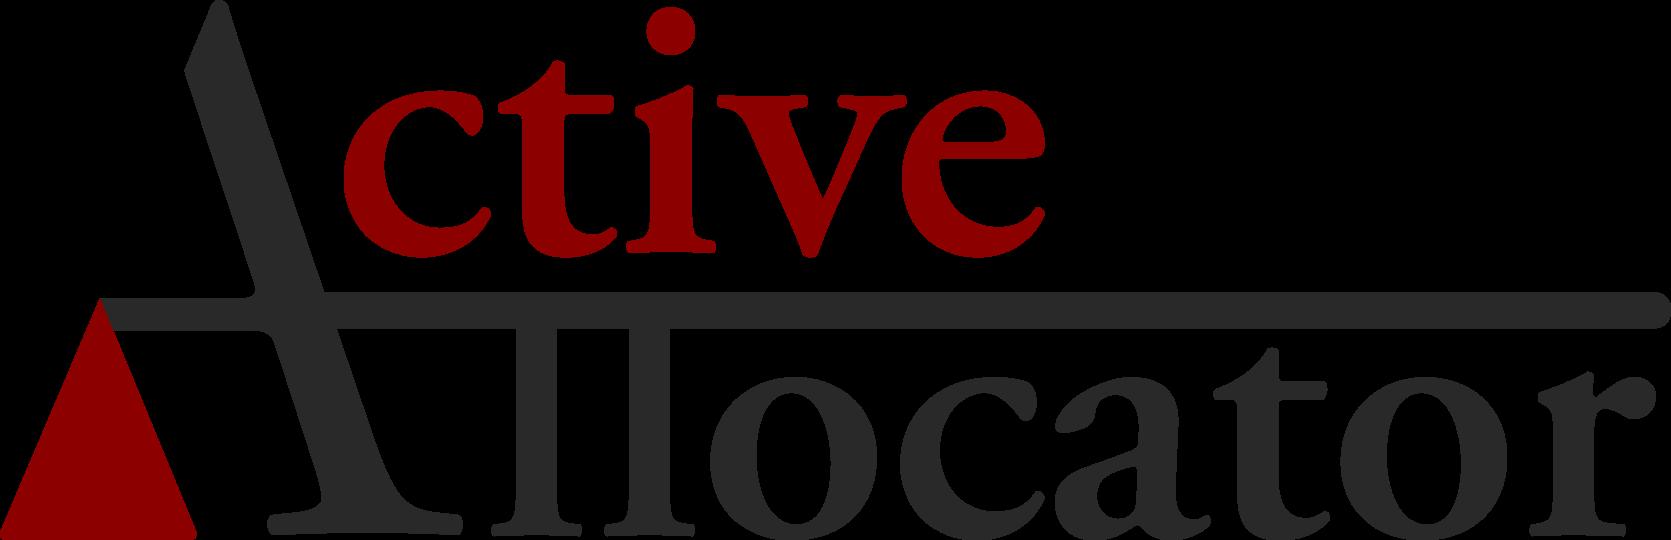 da45d5d0e8 Post navigation. Previous storyKeen Venture Partners Holds First Close of Maiden  VC Fund ...